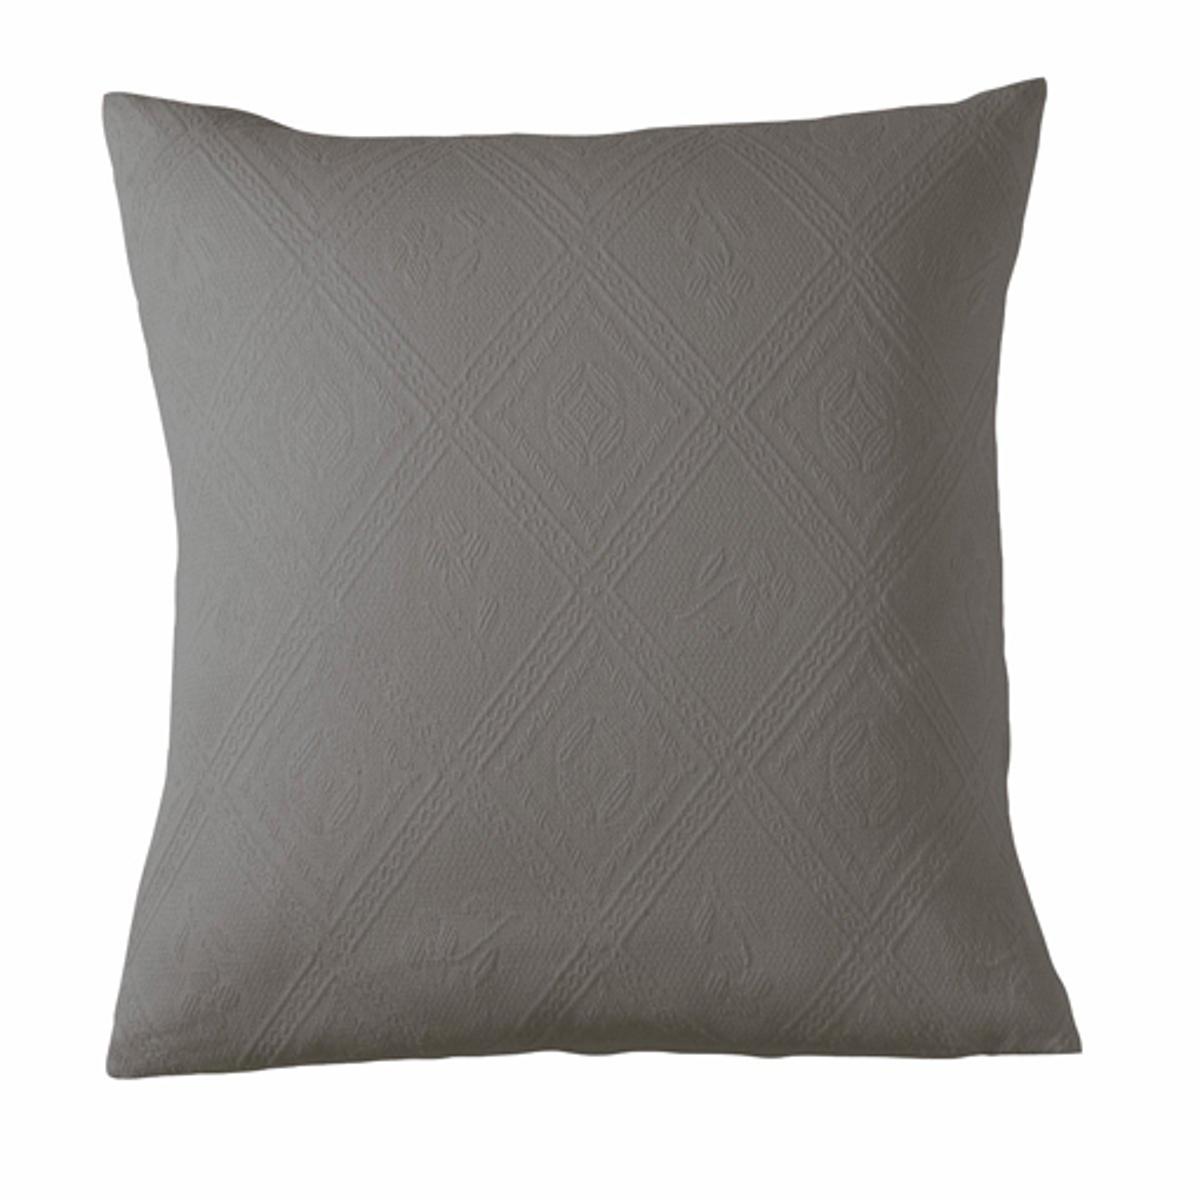 Чехол La Redoute На подушку или наволочка из хлопковой жаккардовой ткани INDO 65 x 65 см серый чехол la redoute для подушки или наволочка однотонного цвета с помпонами riad 65 x 65 см розовый